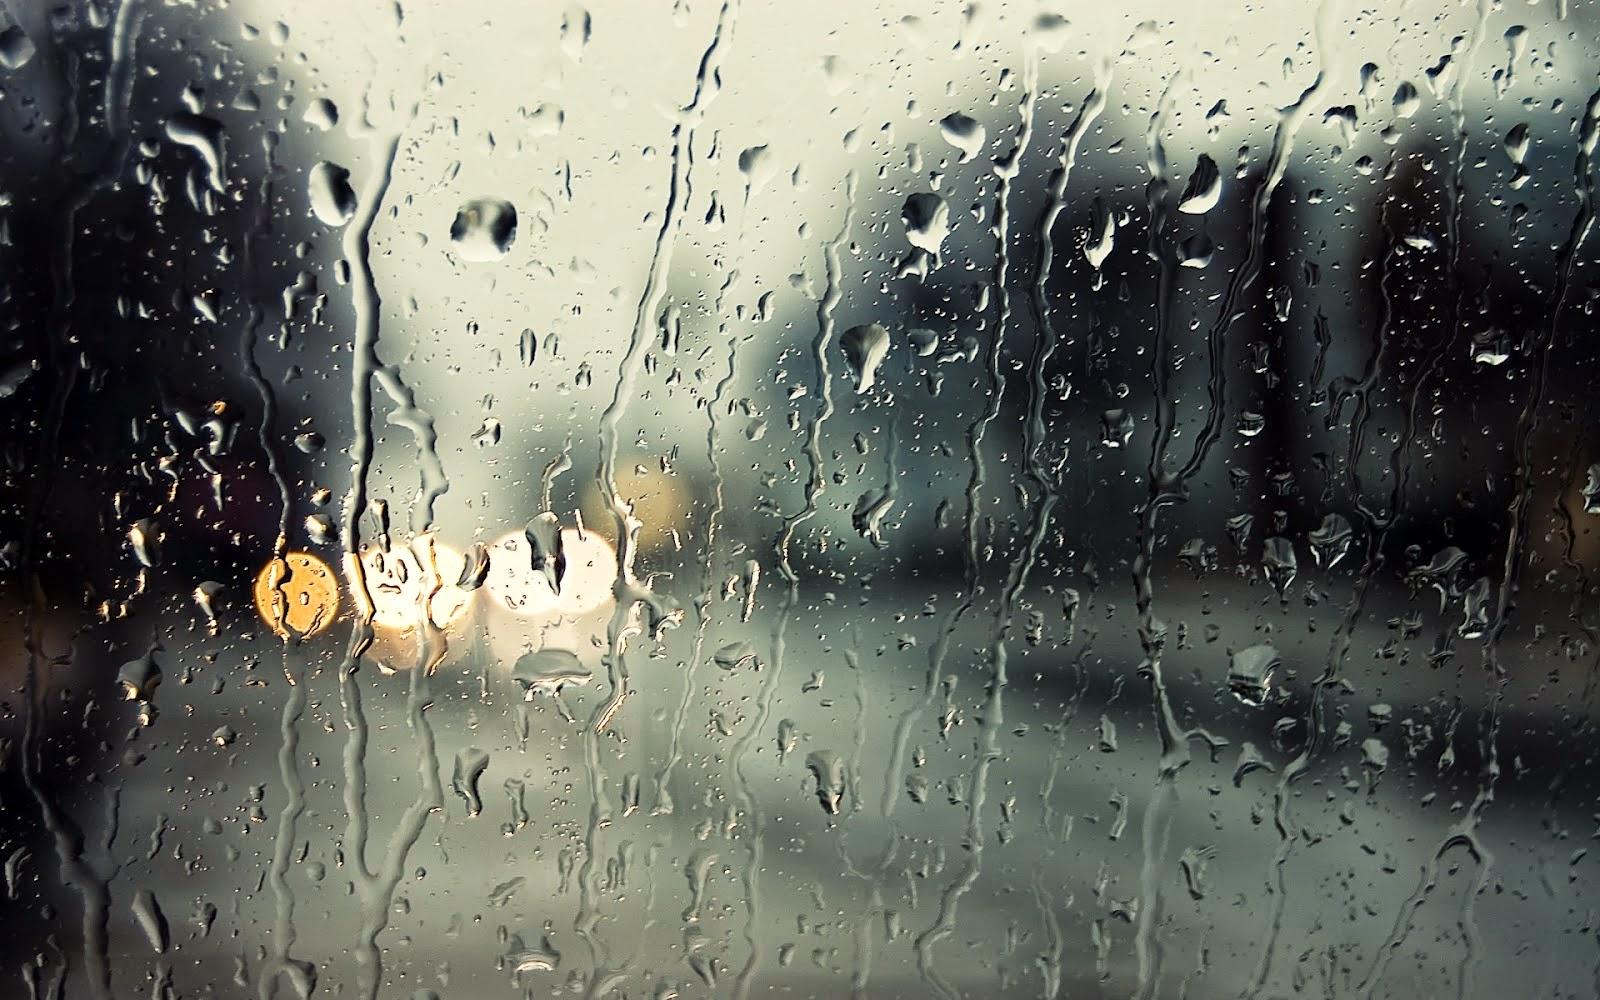 Suara Deras Hujan di Malam Dingin